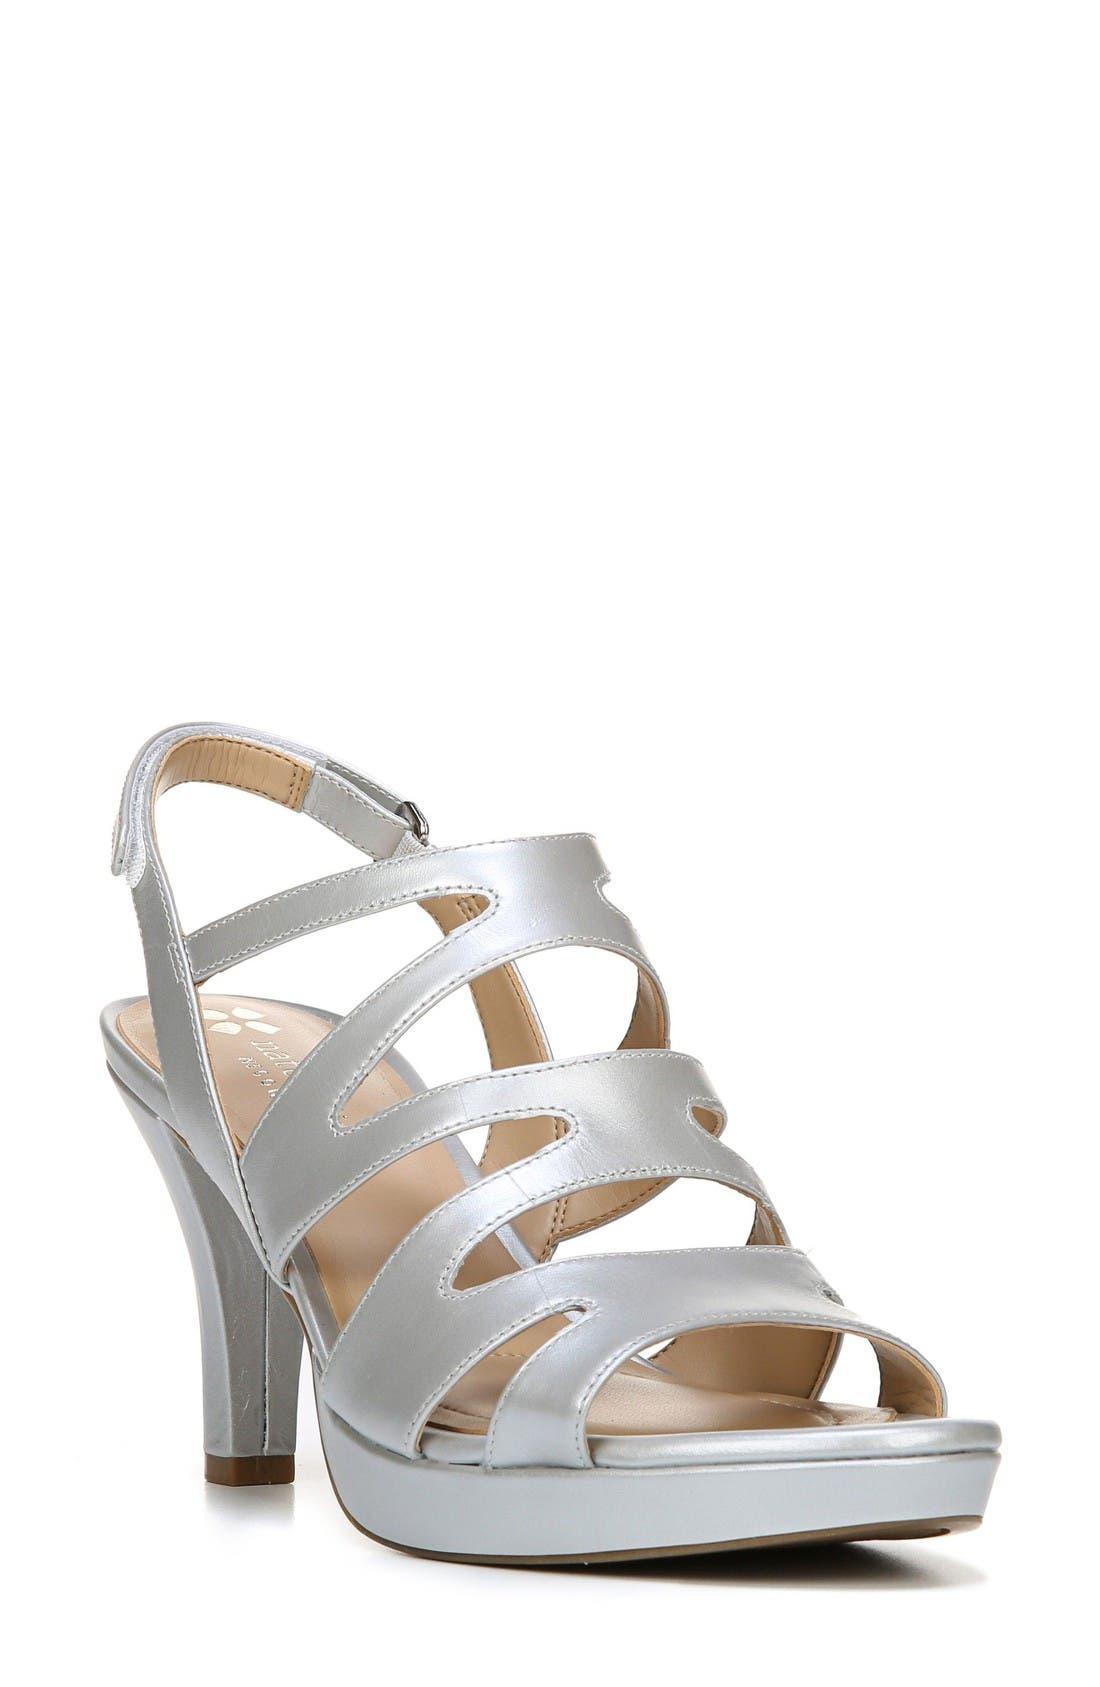 'Pressley' Slingback Platform Sandal,                             Main thumbnail 1, color,                             Silver Leather